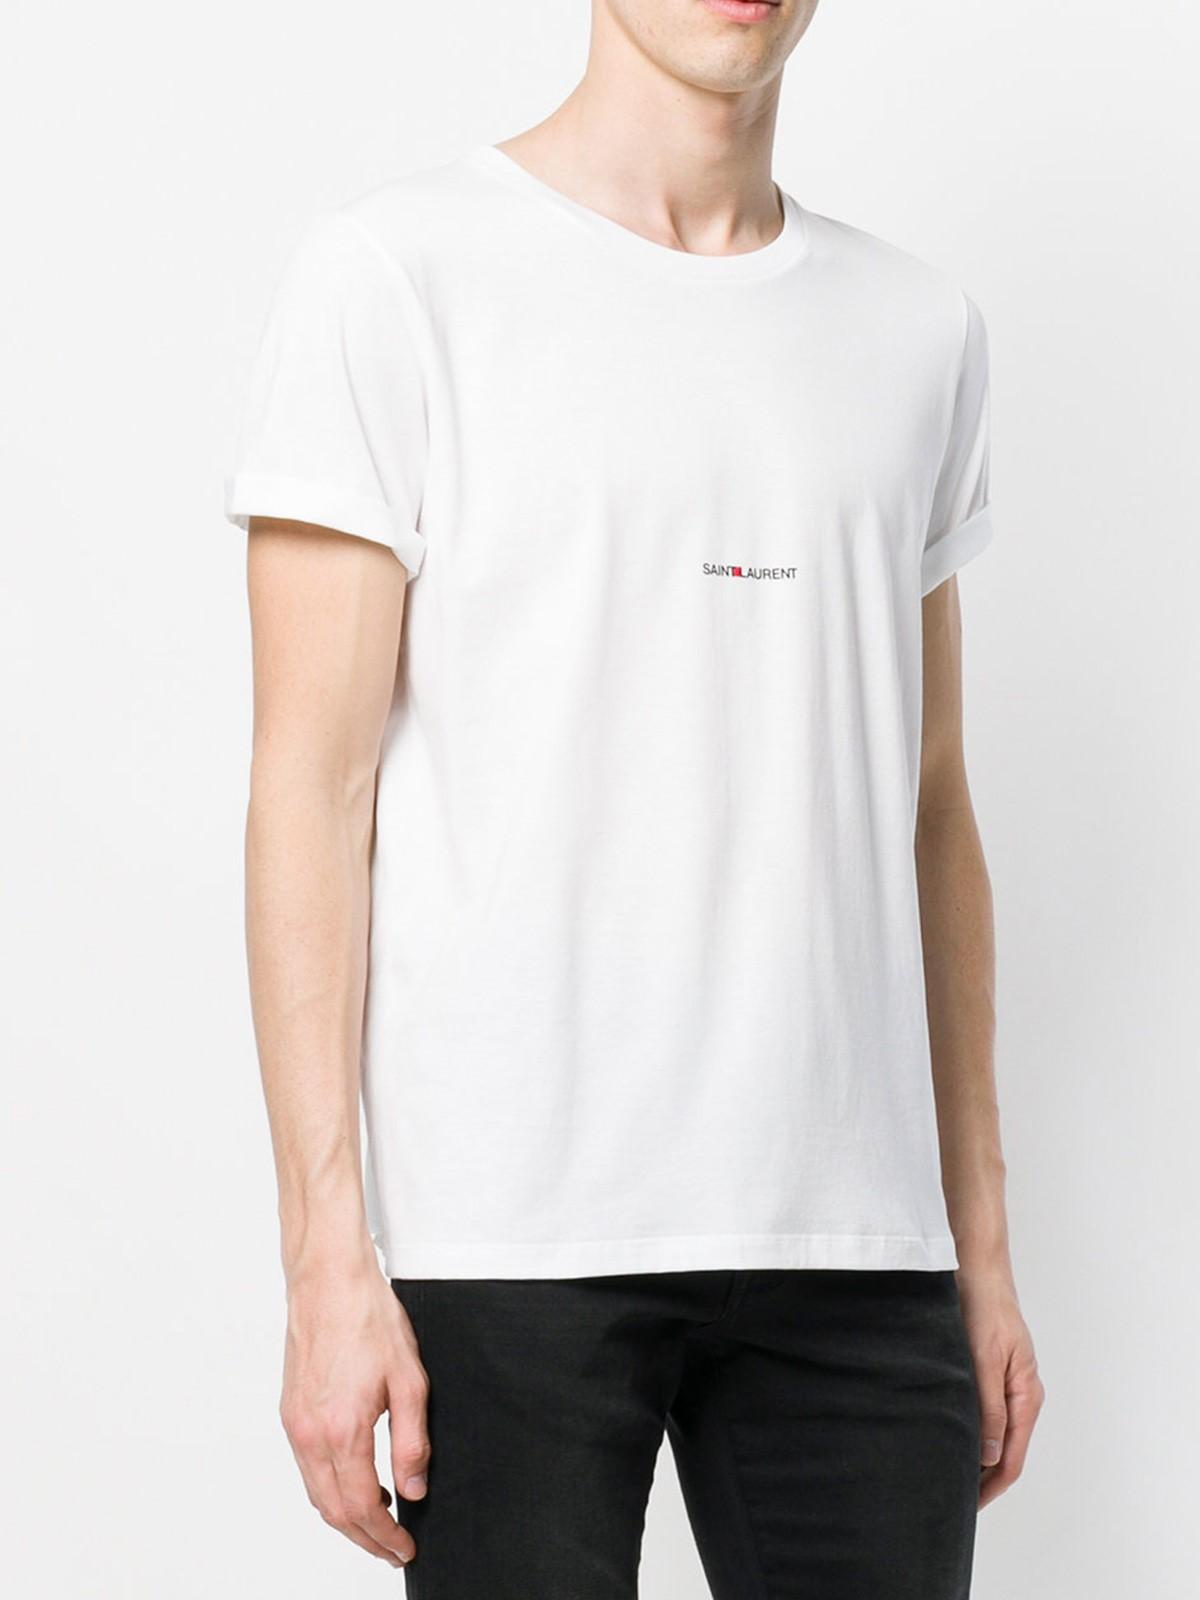 saint laurent logo t shirt available on. Black Bedroom Furniture Sets. Home Design Ideas